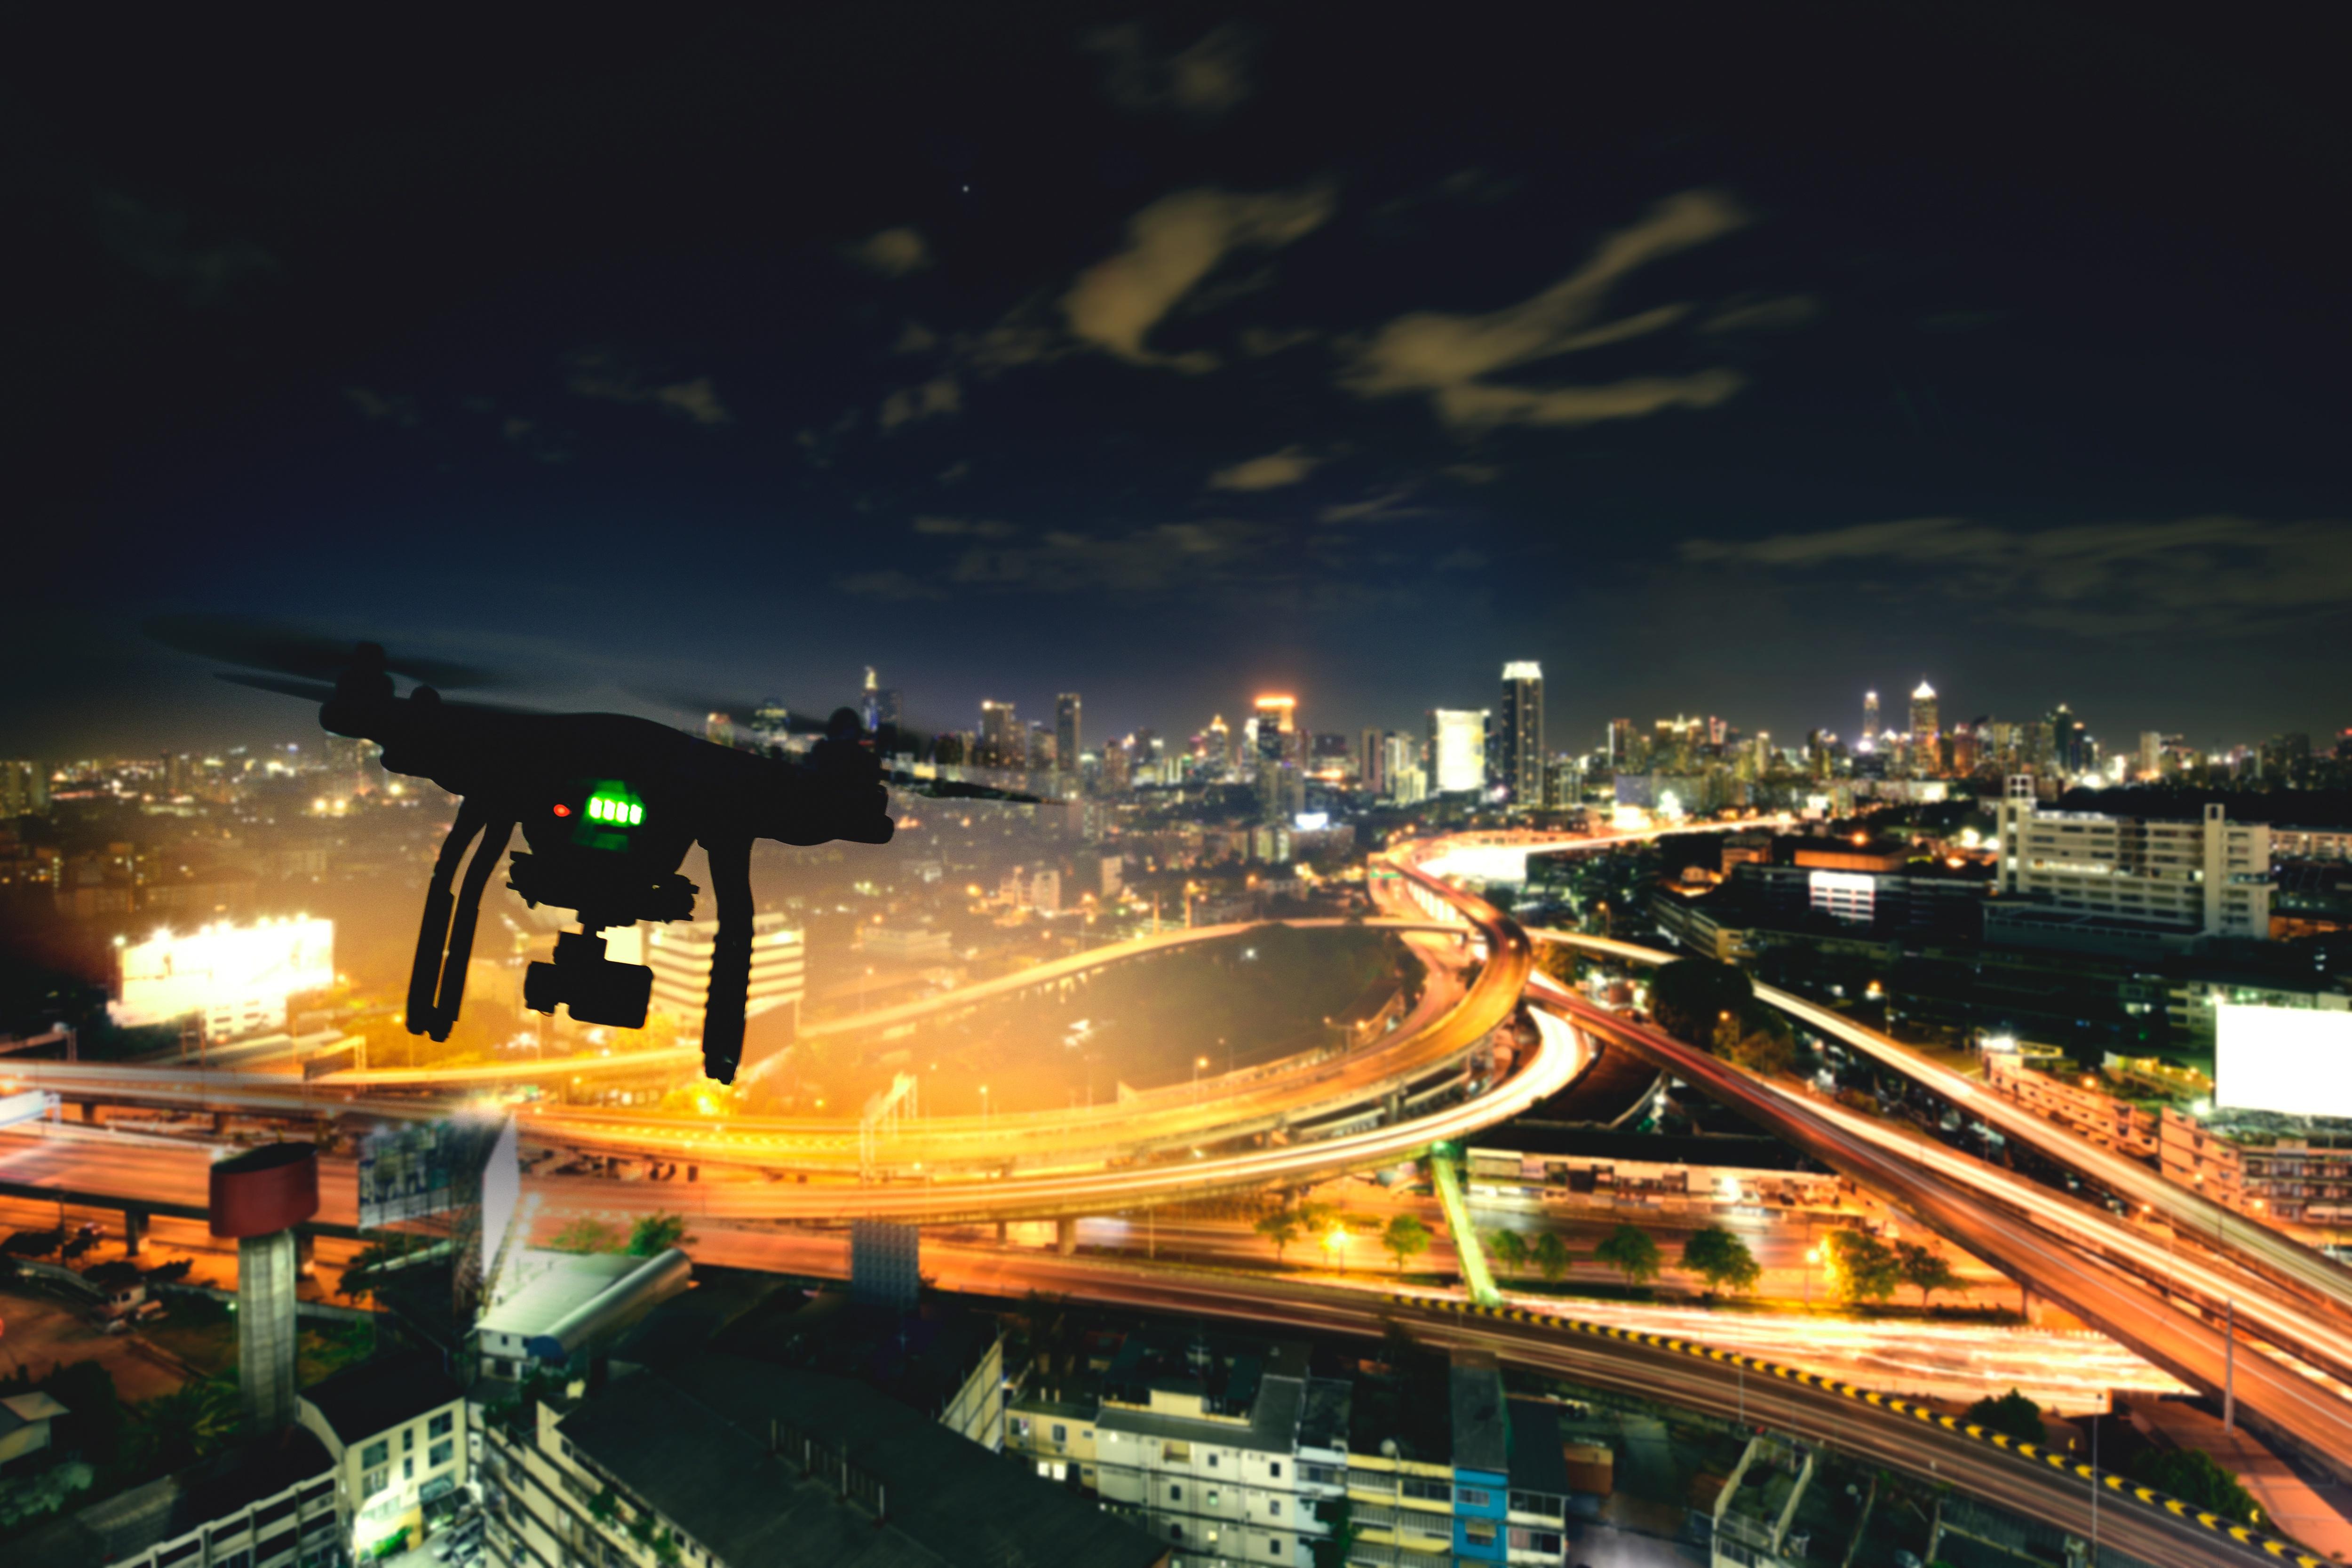 Truck Fleets Will Soon Use Drones